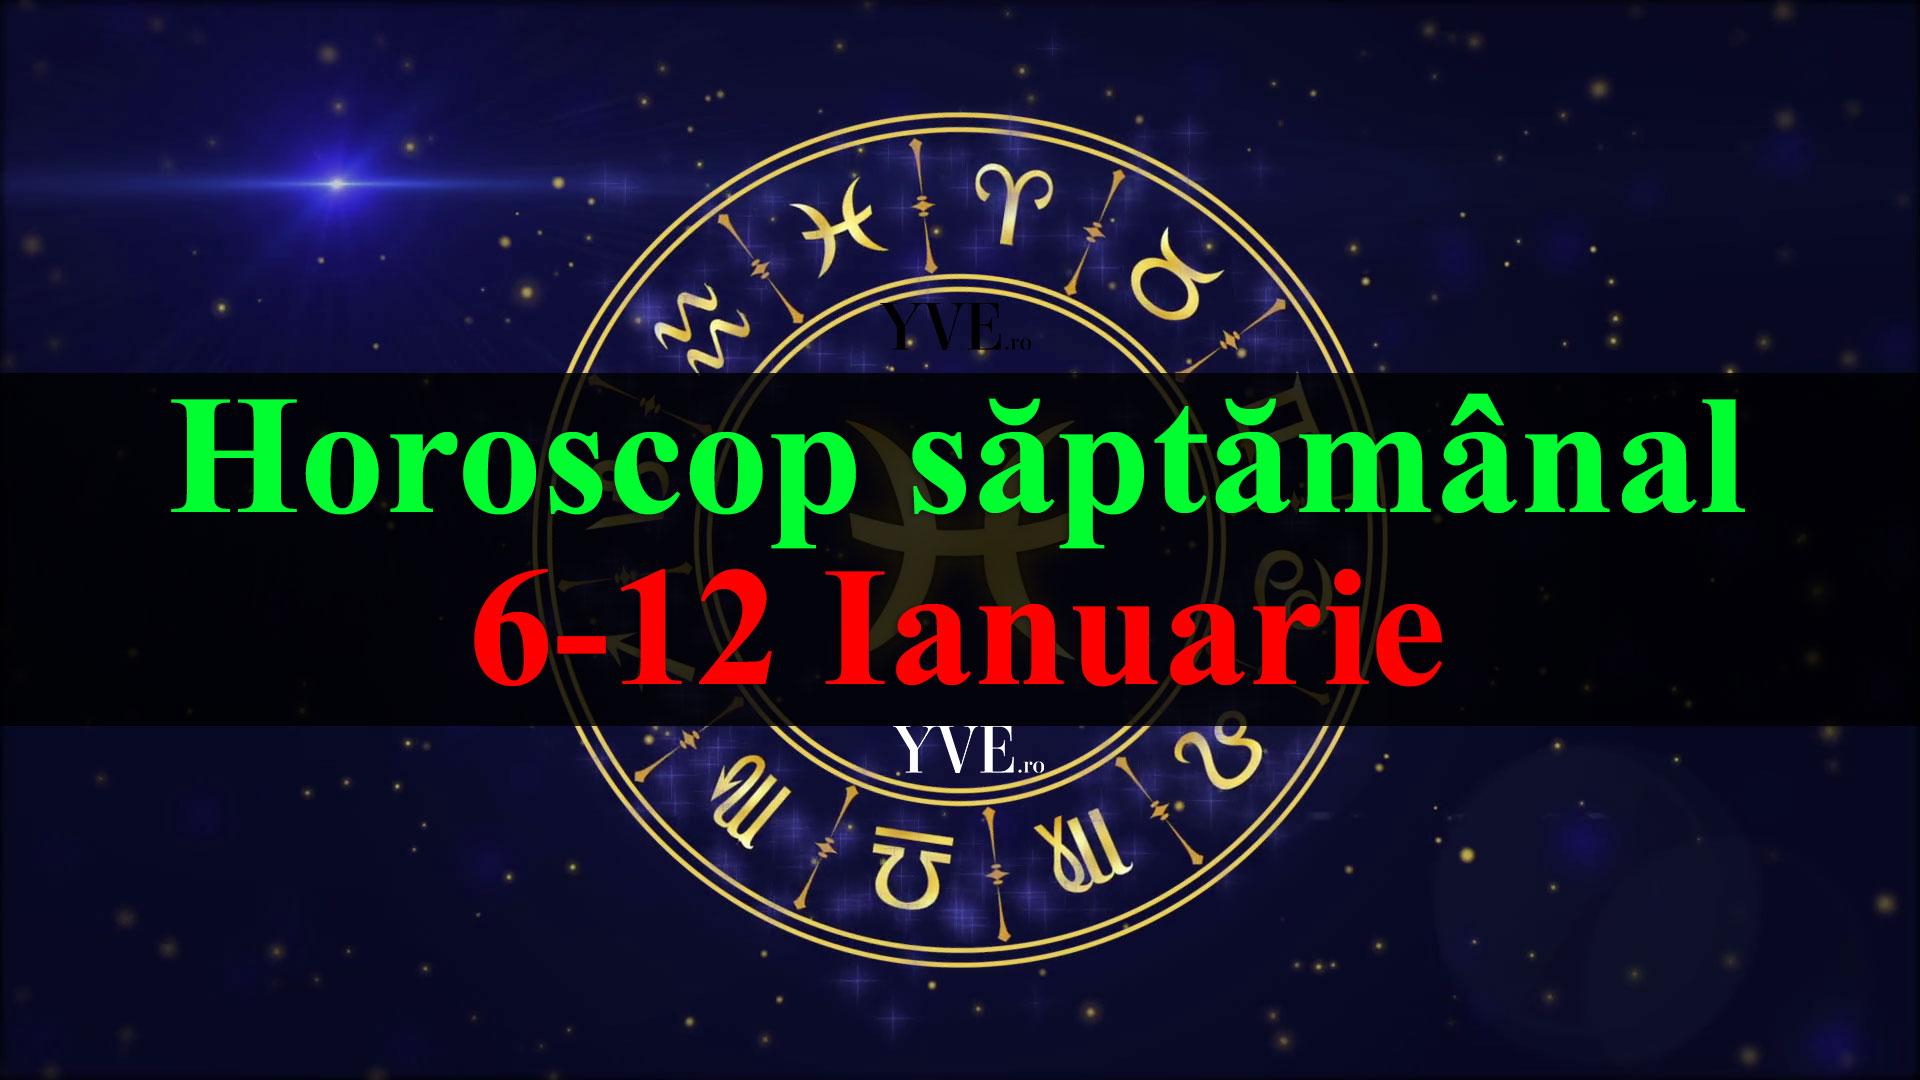 Horoscop saptamanal 6-12 Ianuarie 2020